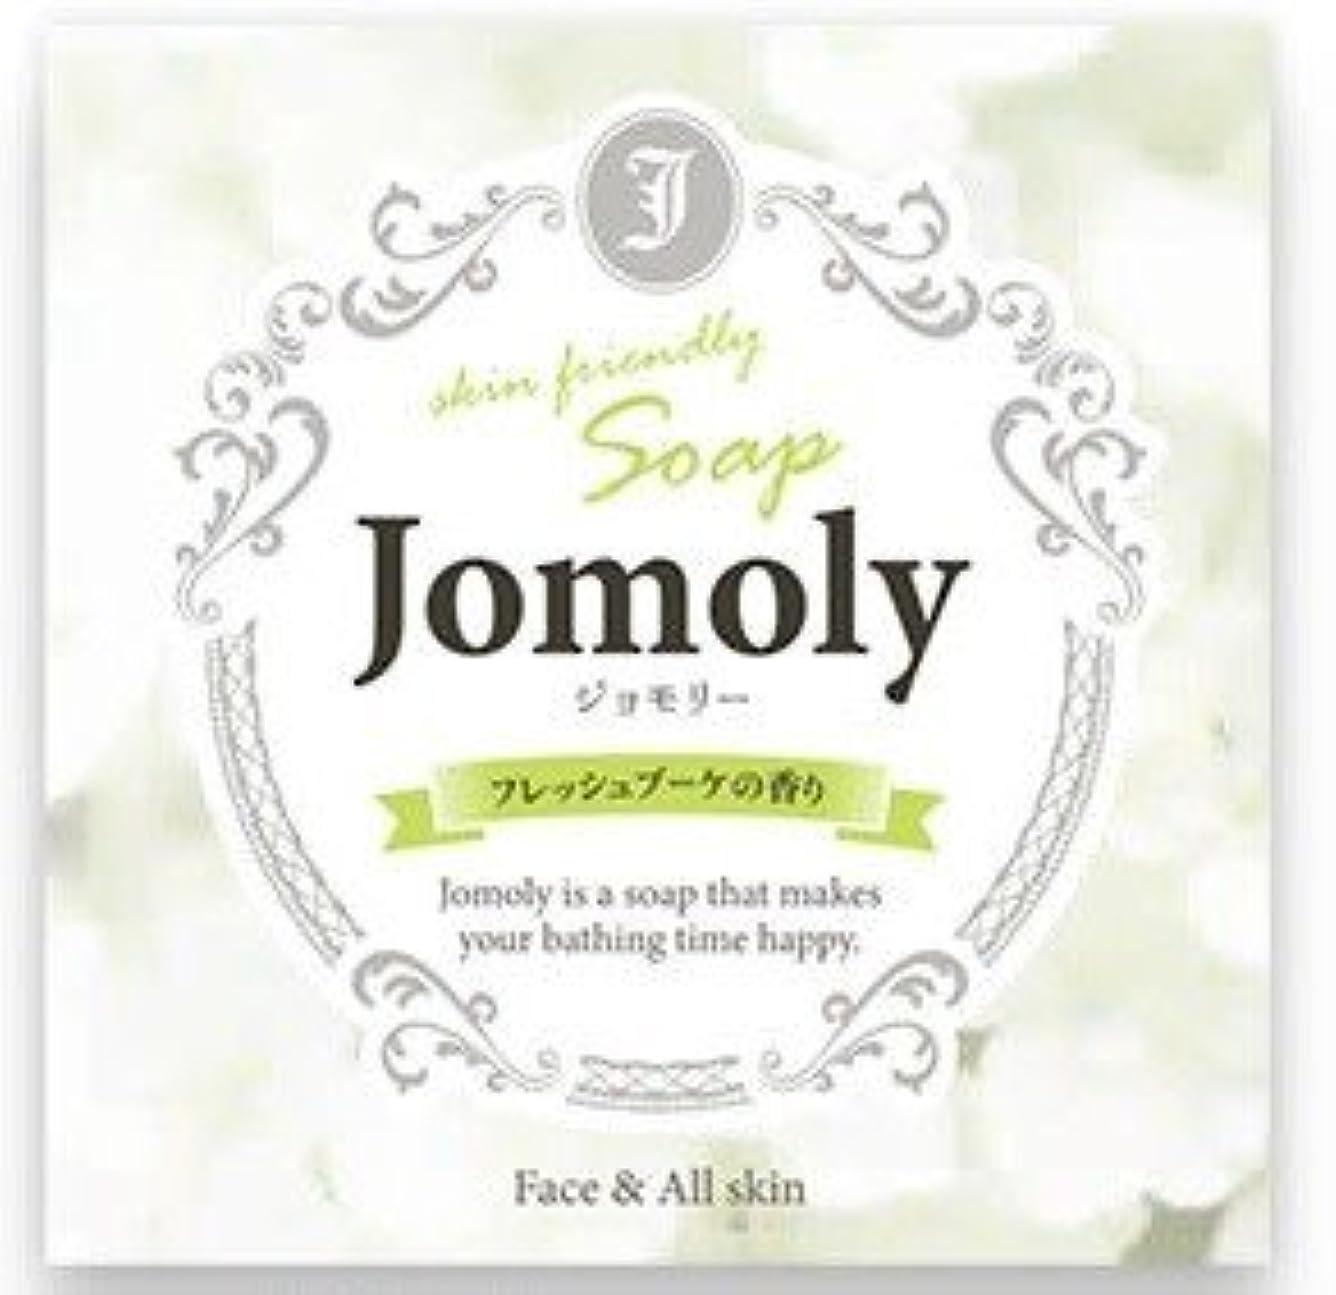 Jomoly(ジョモリー)80g